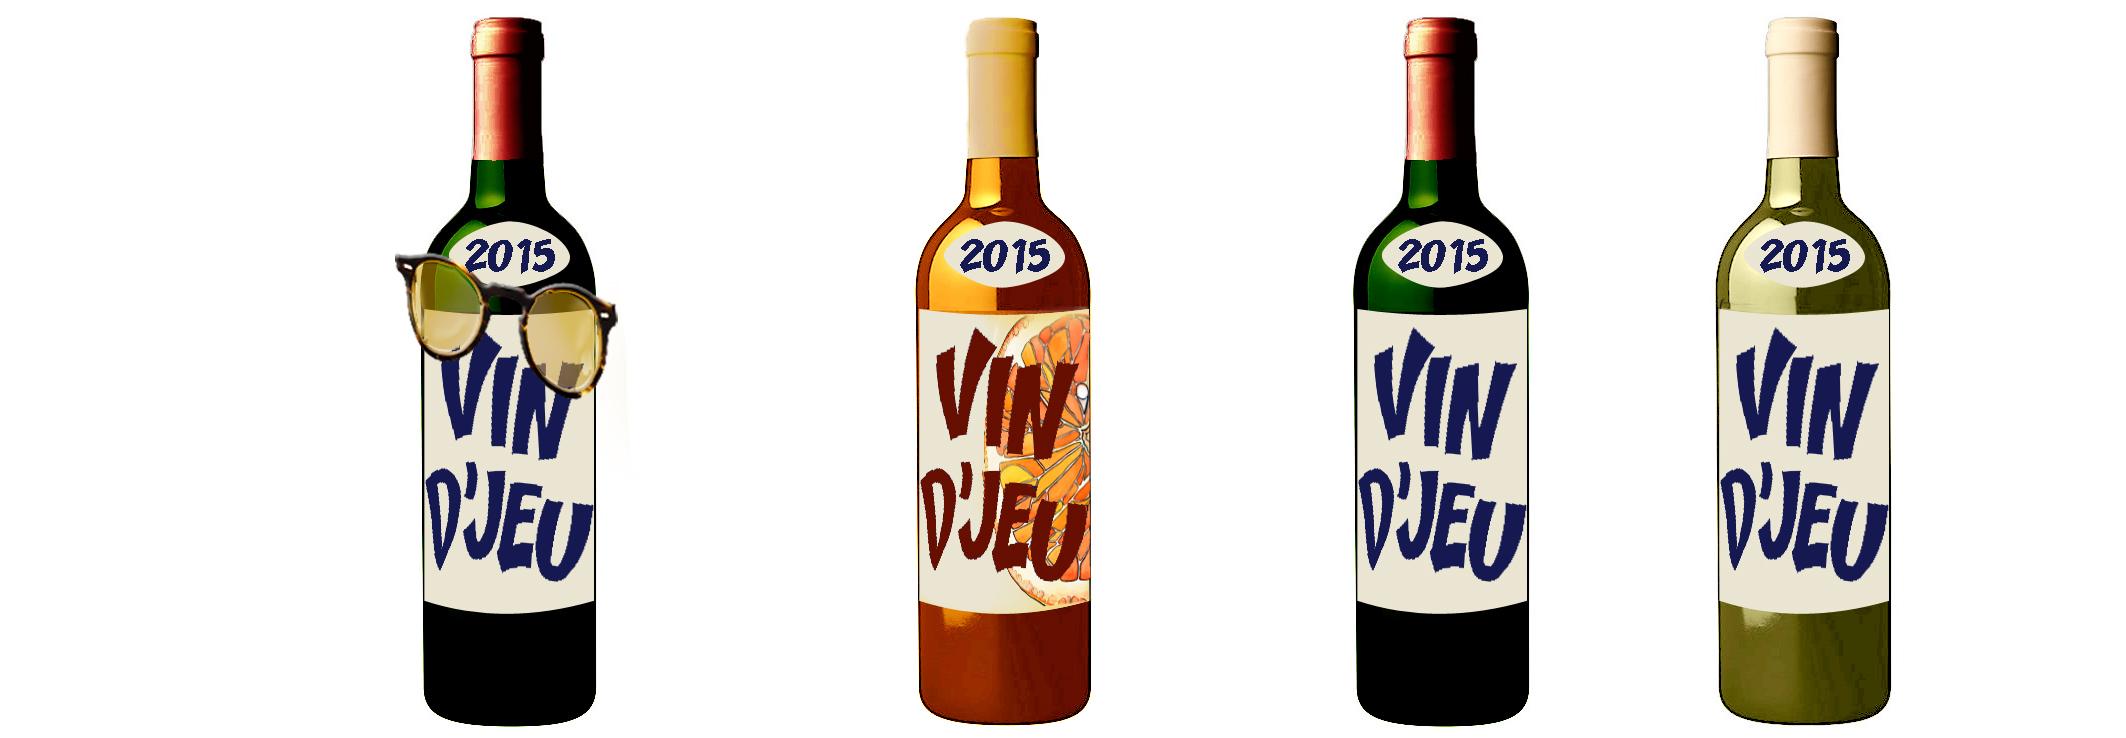 4 bouteilles vin djeu 2015